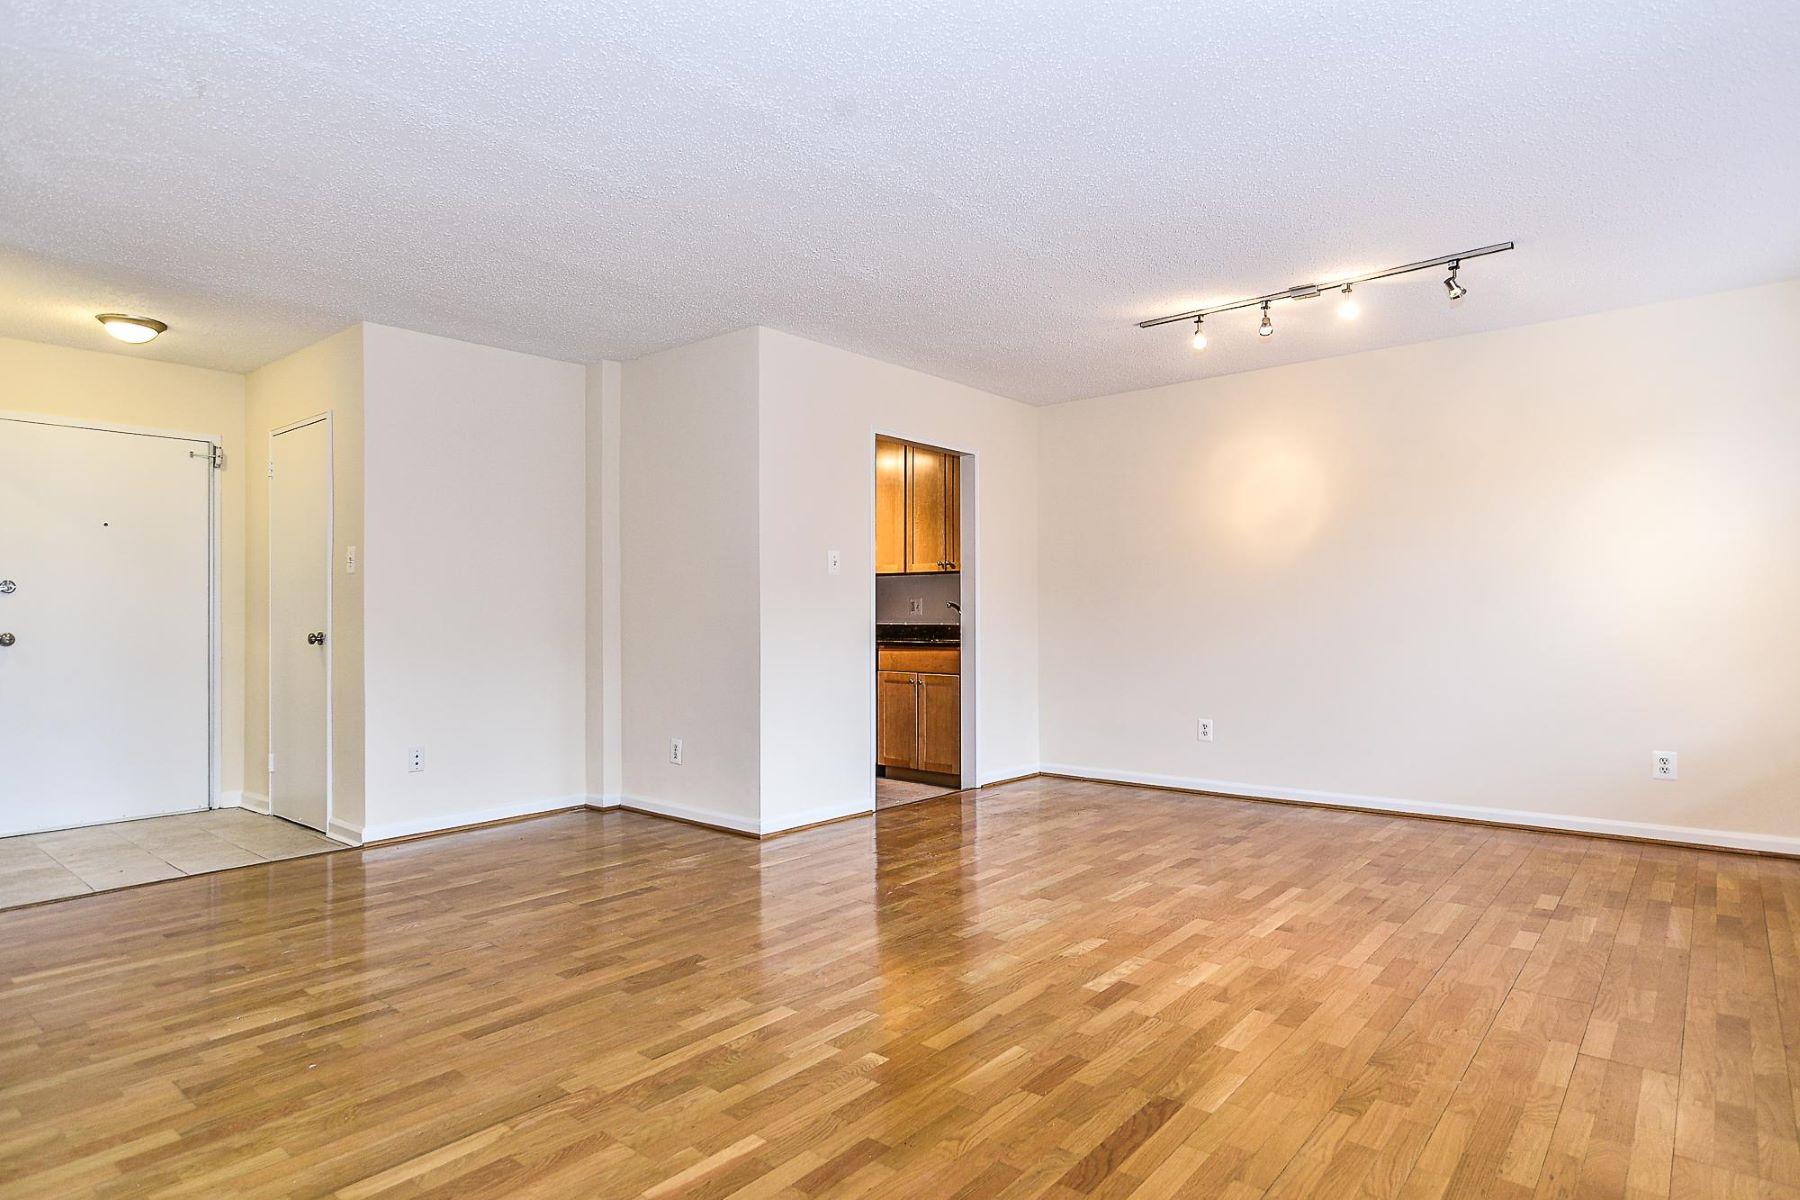 Condominium for Sale at 1730 Arlington Blvd #505 1730 Arlington Blvd #505 Arlington, Virginia 22209 United States